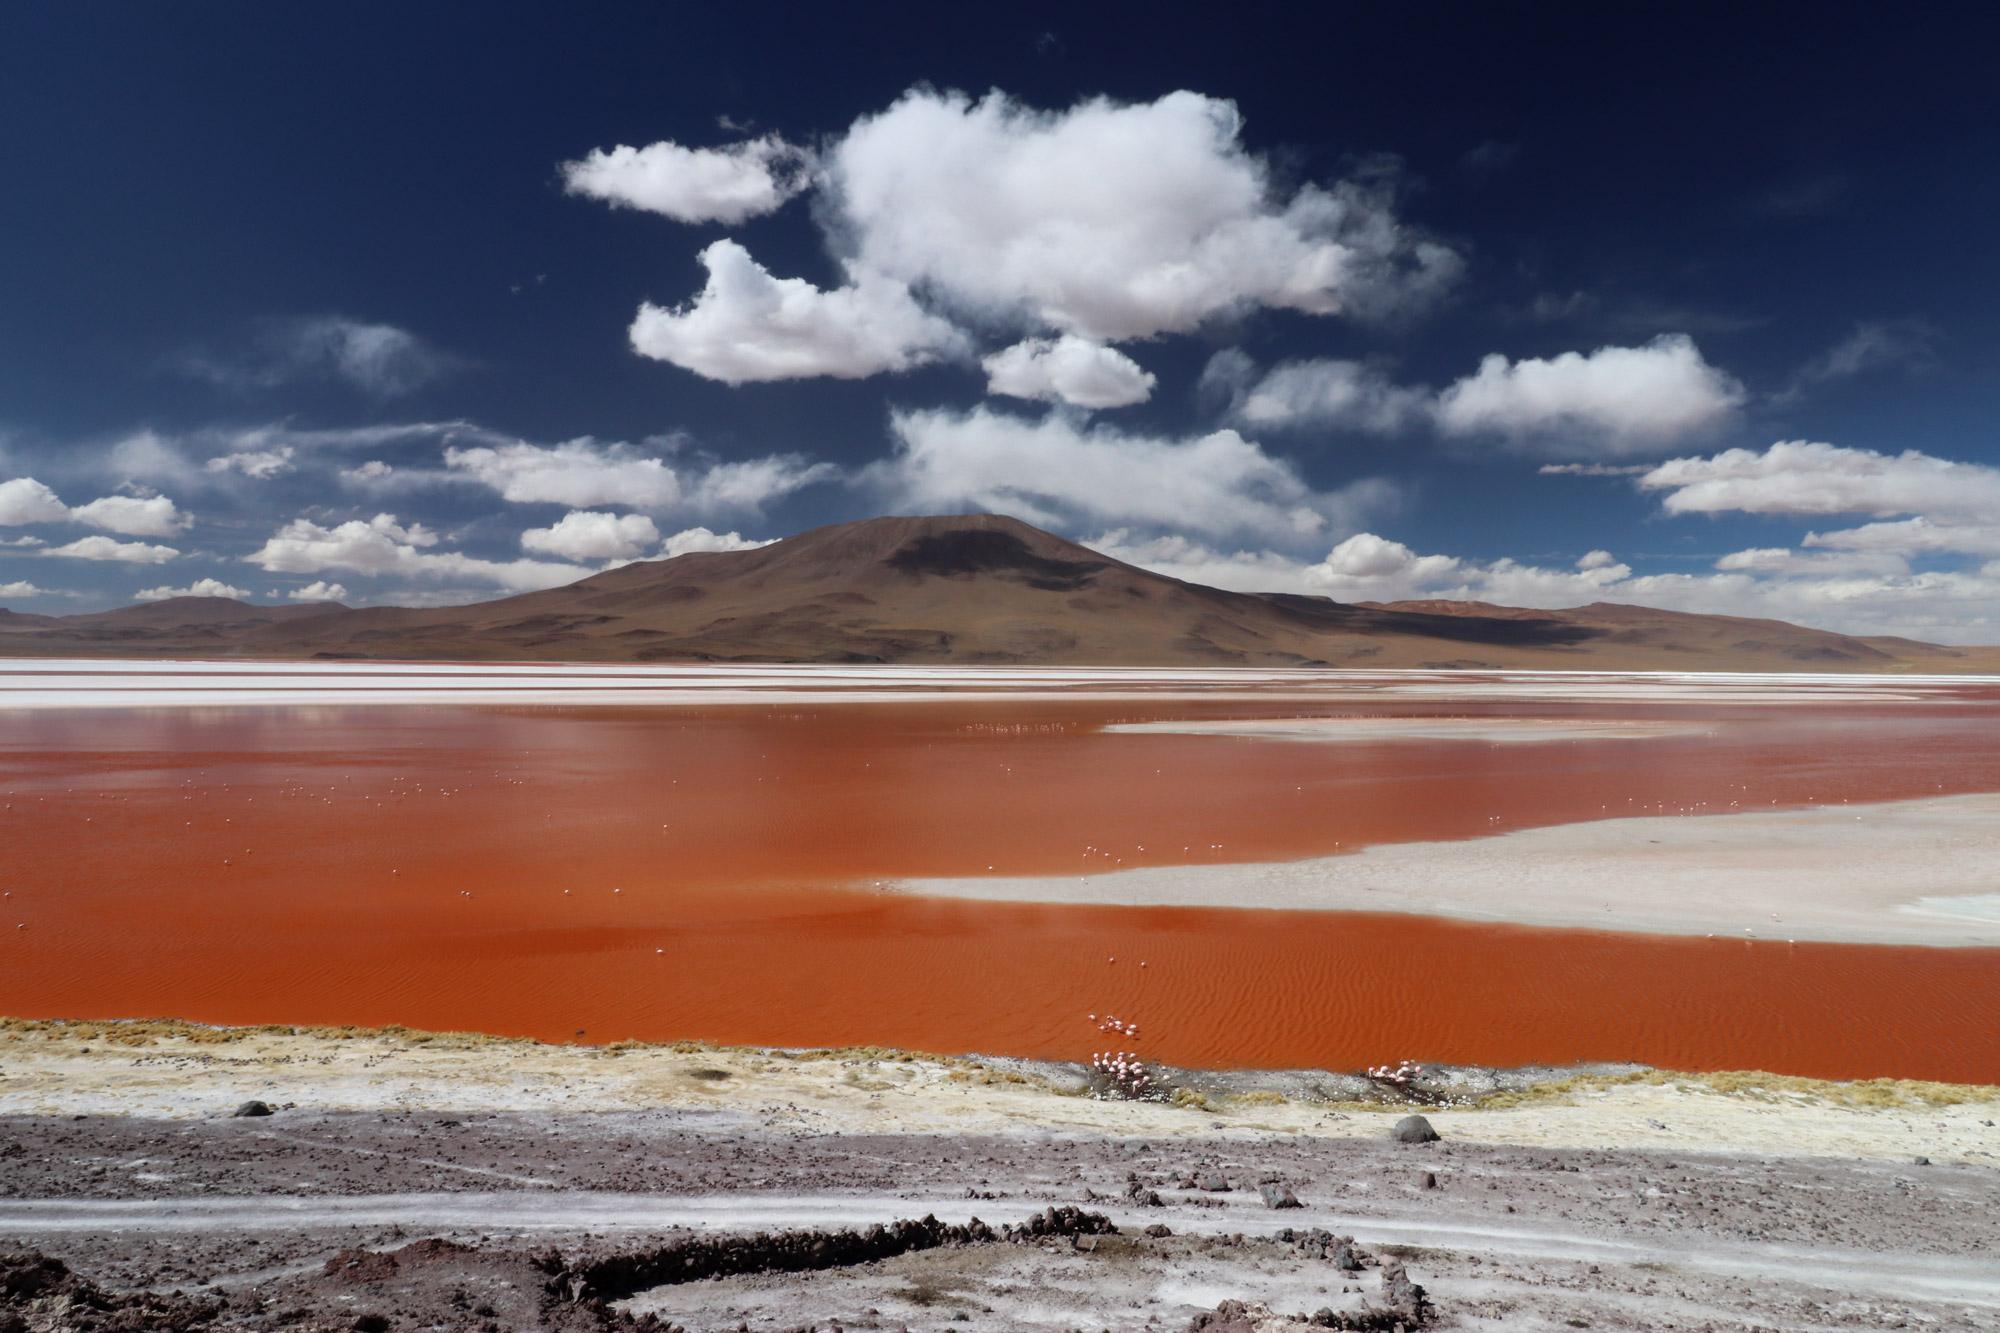 Bolivia 2016 - Dag 10 - Laguna Colorada